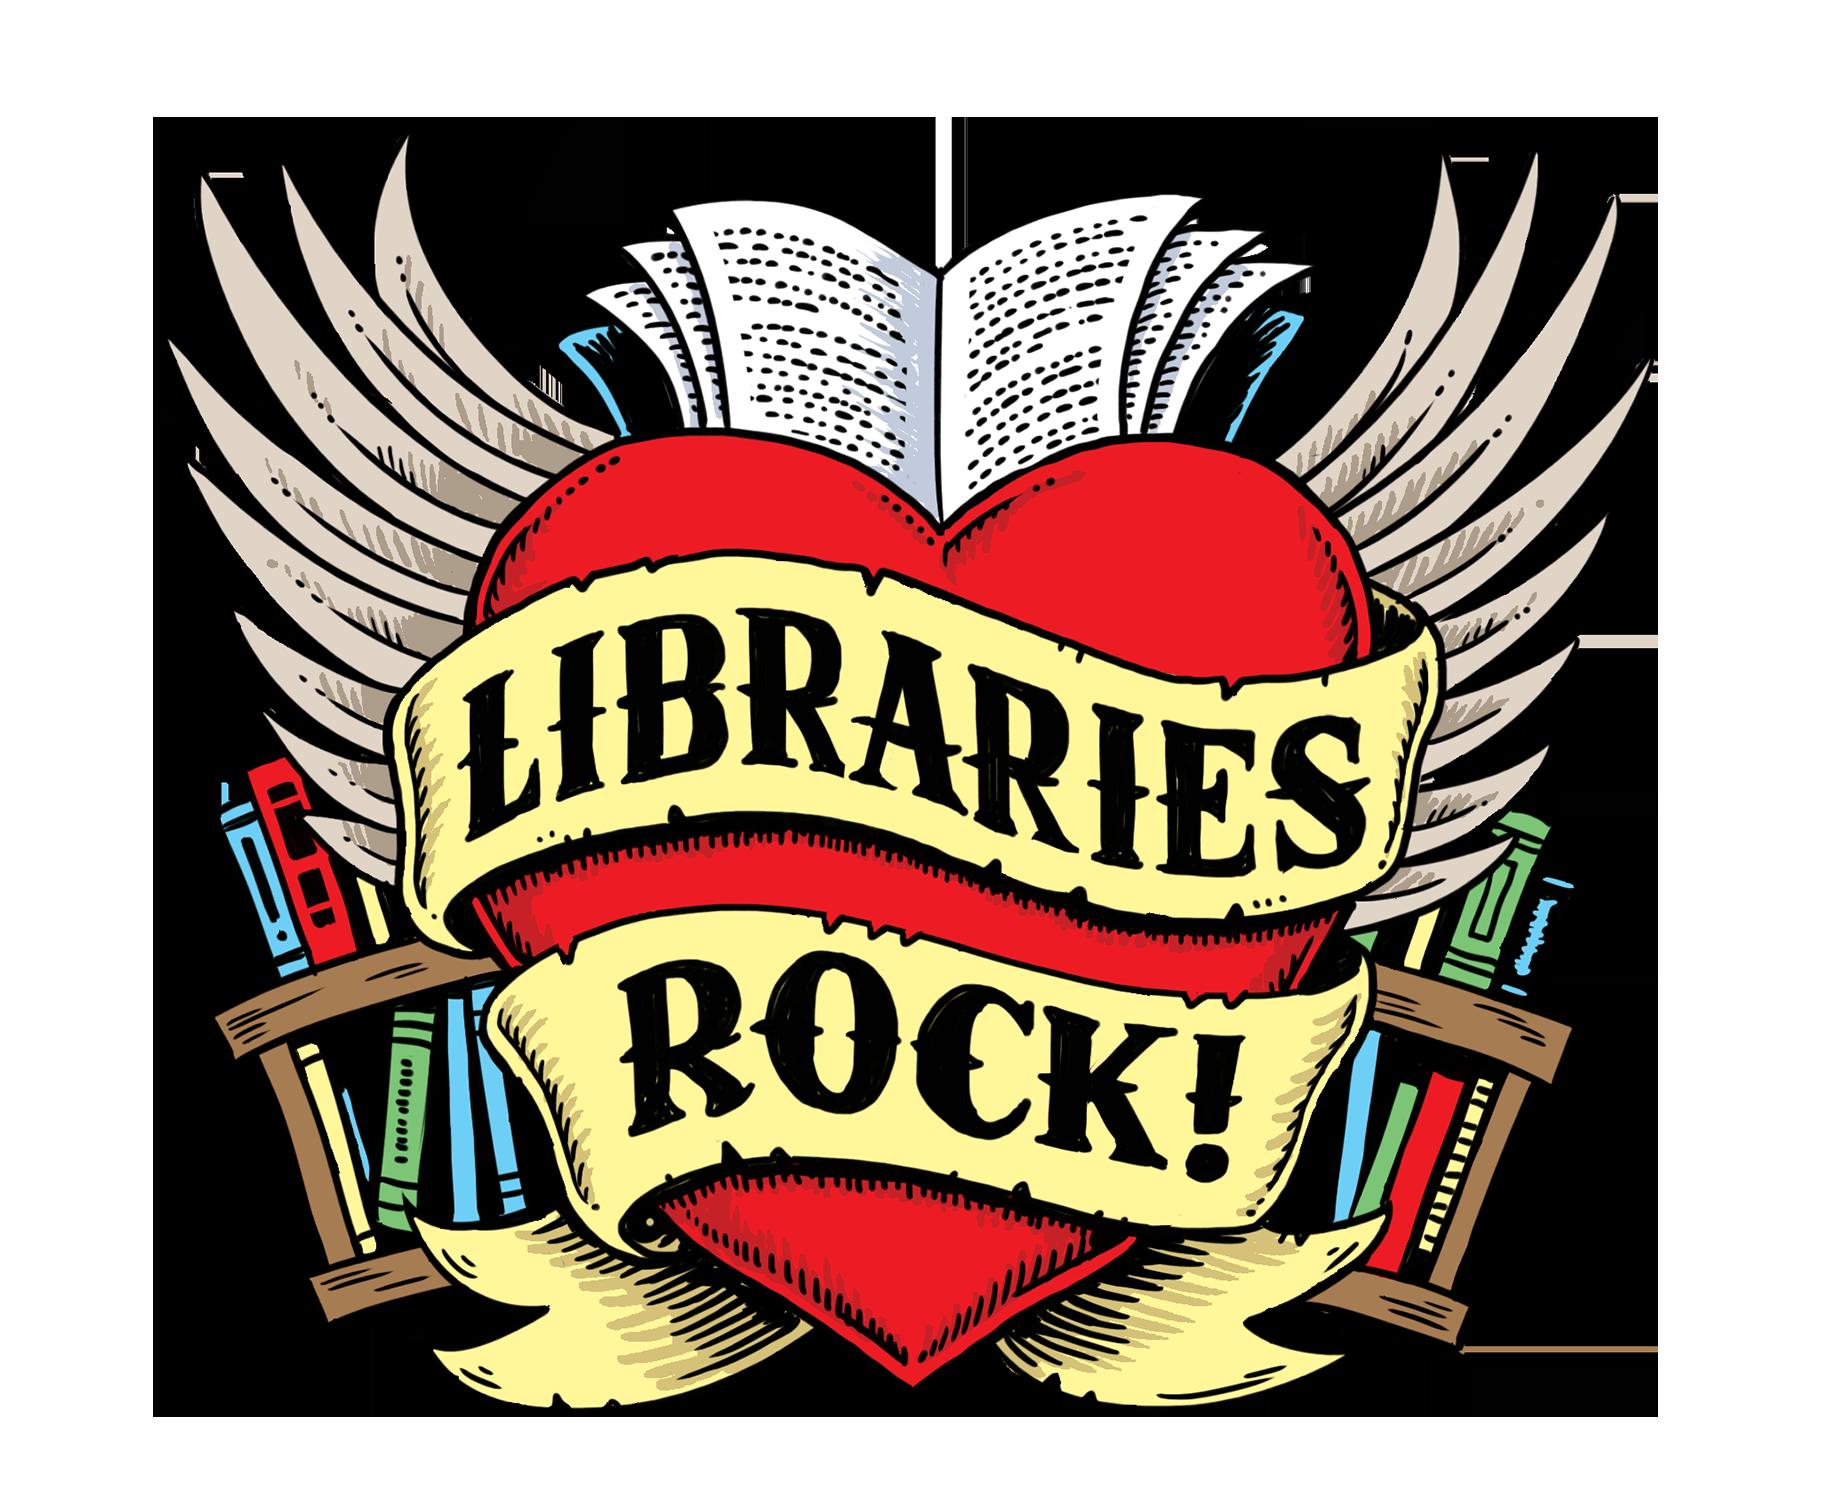 Library book return clipart clip art transparent download Summer Reading Starts June 4 clip art transparent download